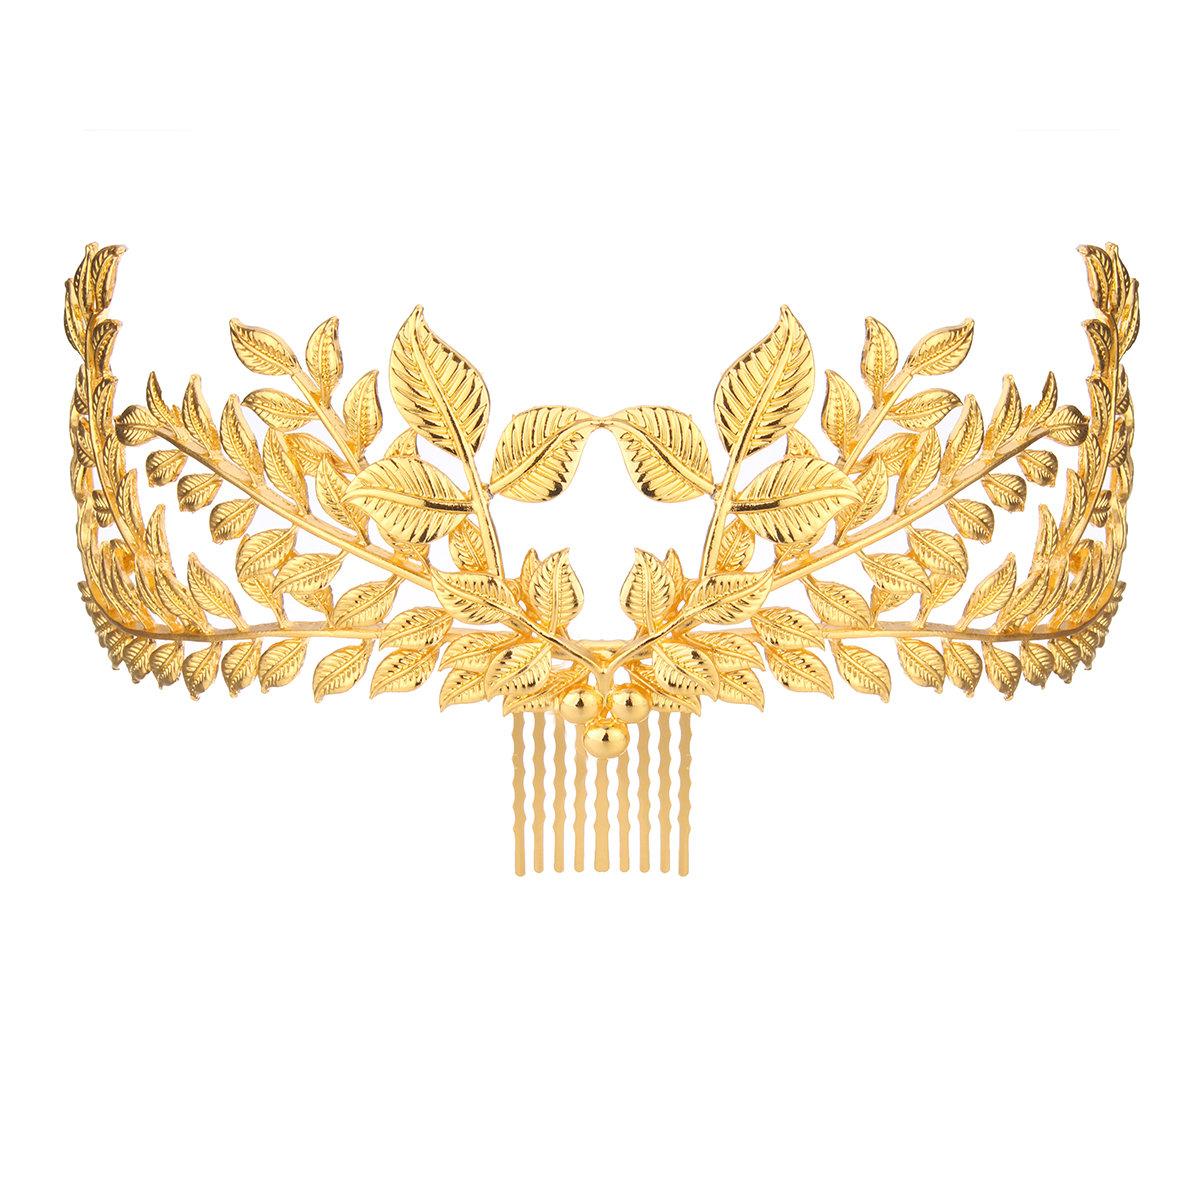 Vintage 20's Headpiece Comb Bride Gold Leaf Headdress Headband Roman Hair Crown